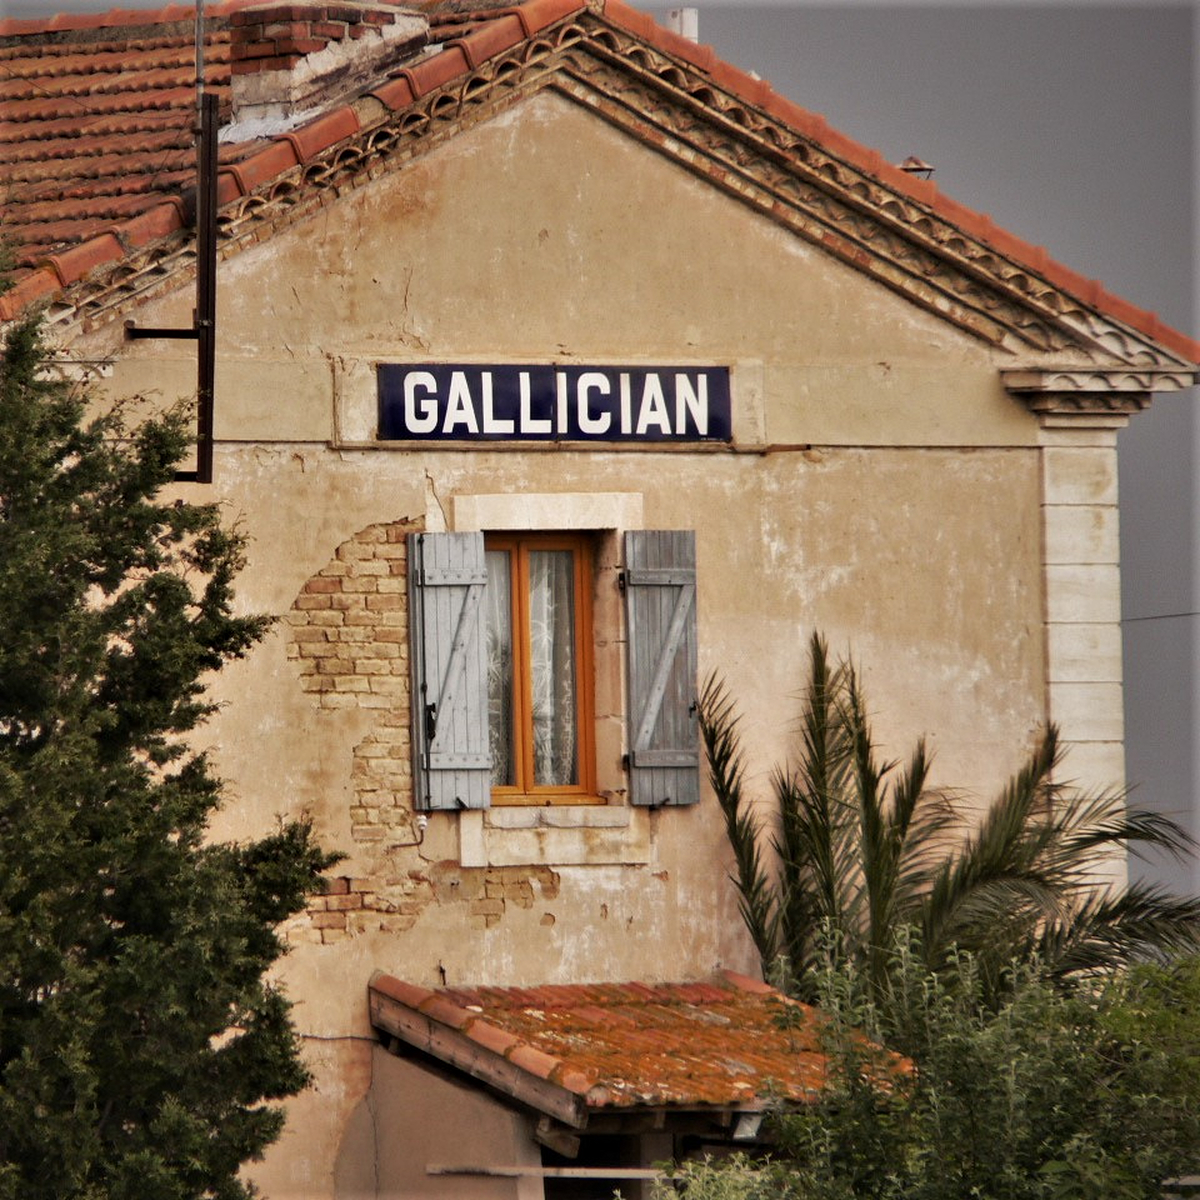 Gallician ©1MP2